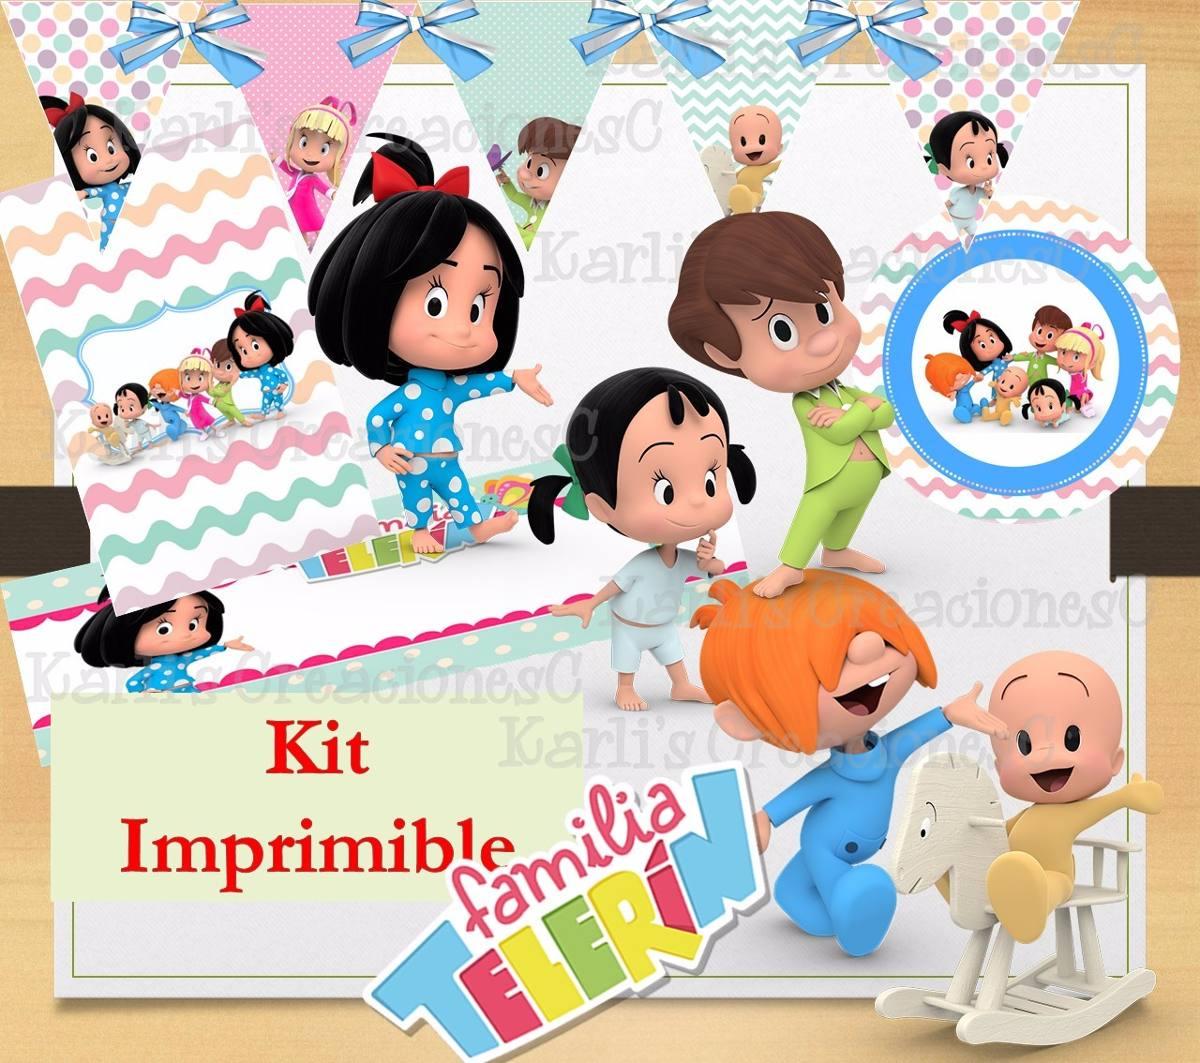 kit imprimible familia telerin 30 00 en mercado libre